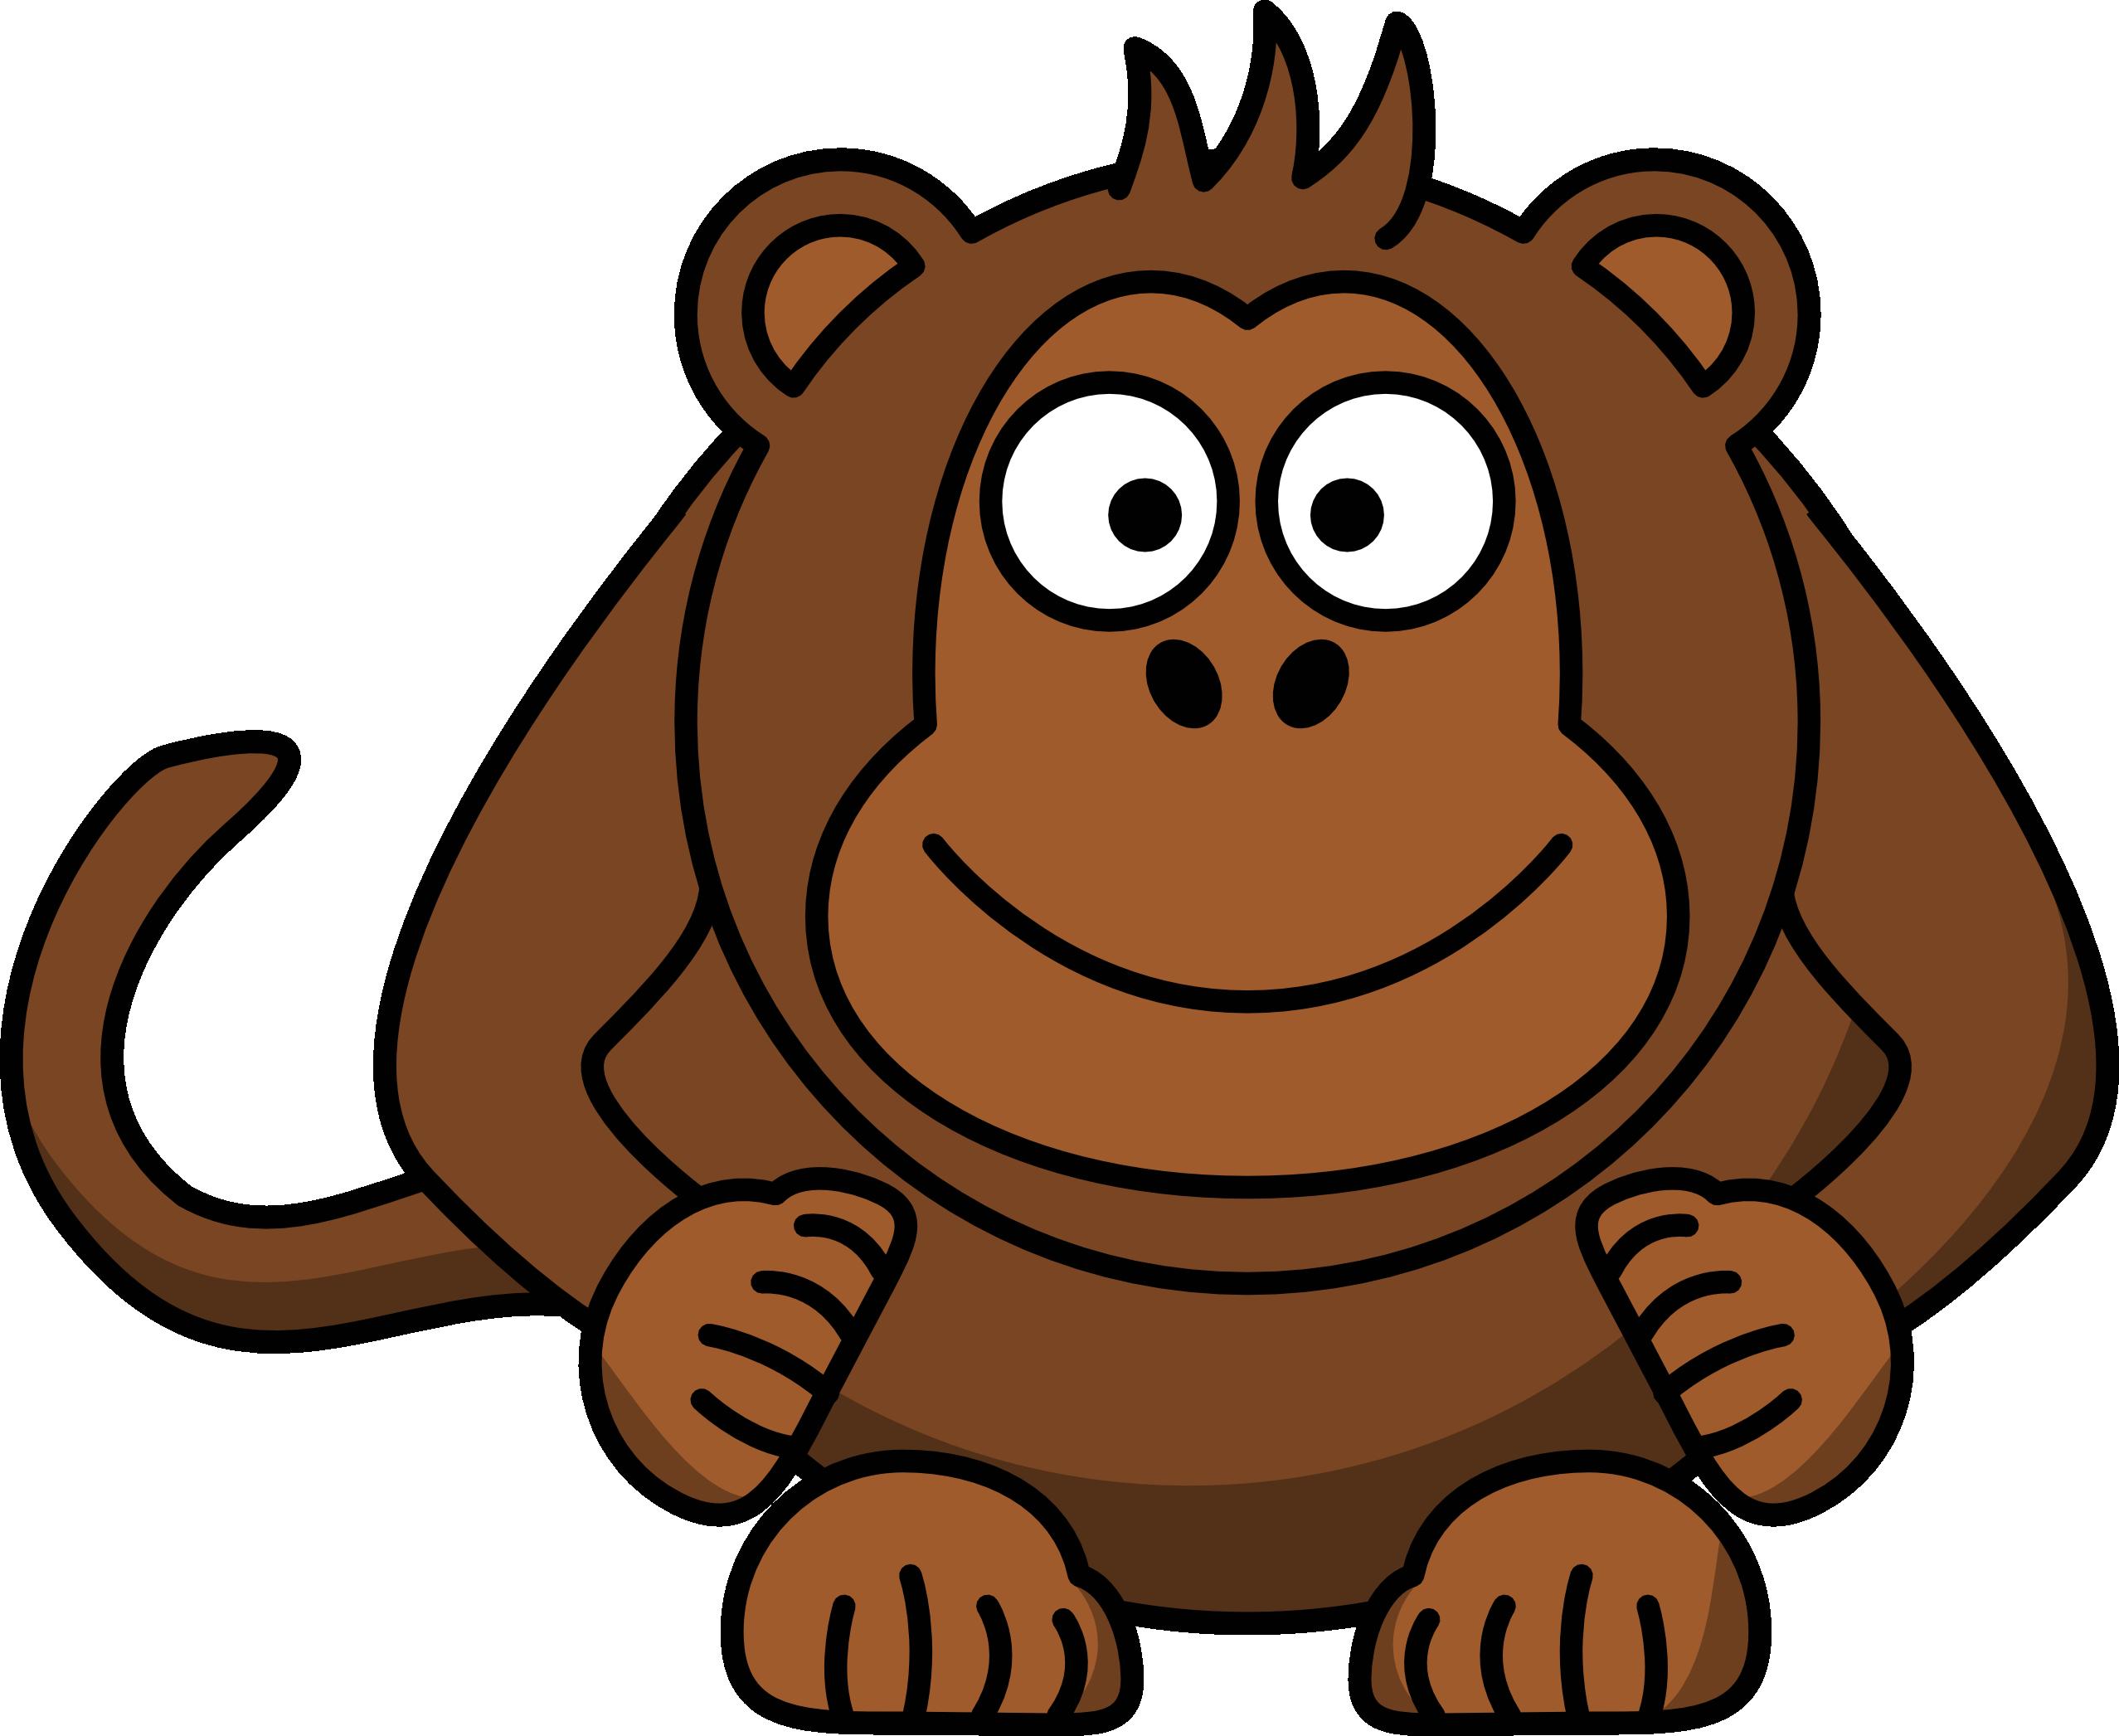 2555x2093 Monkey Cartoon Drawings